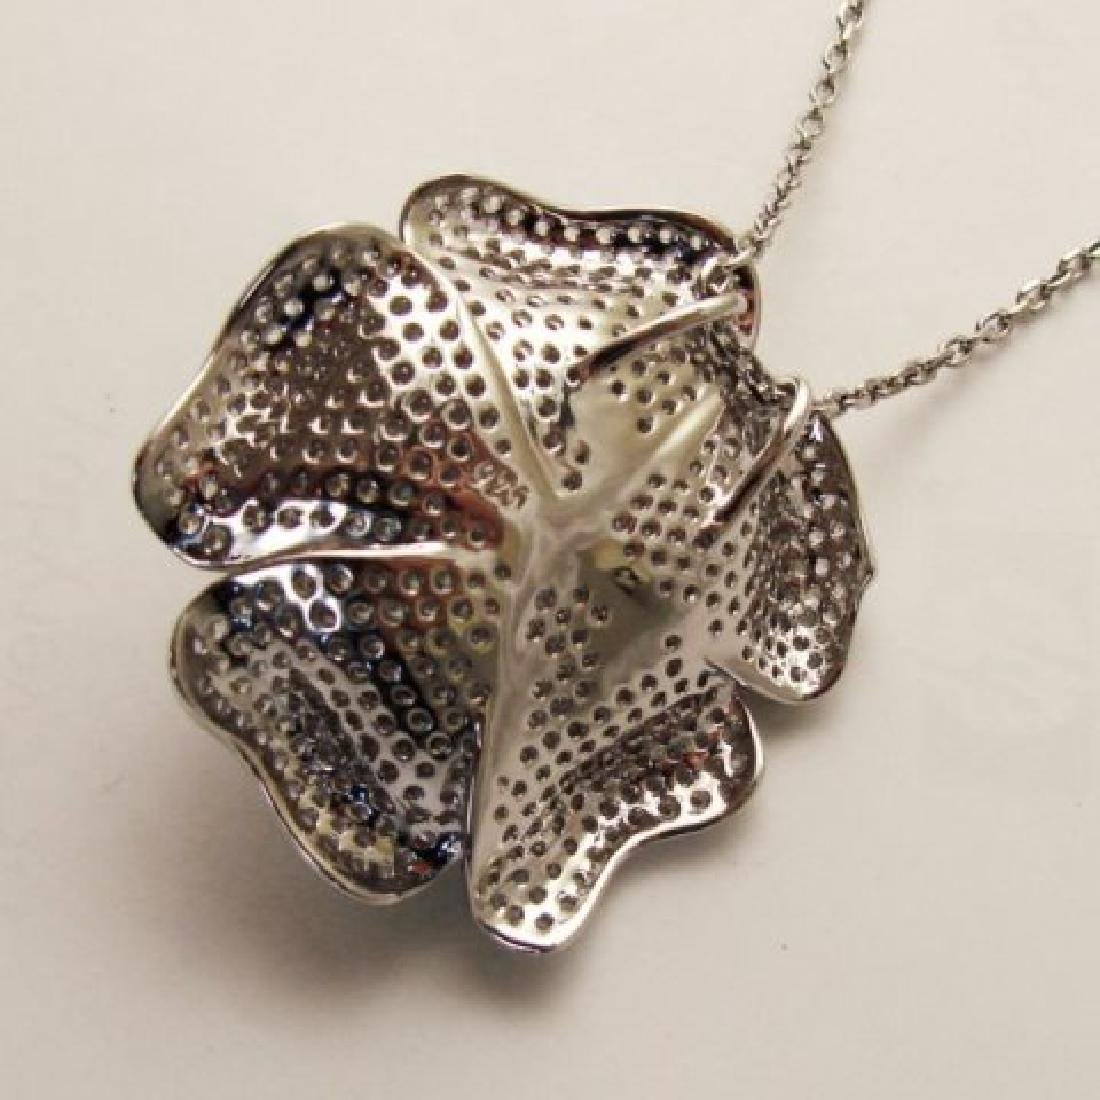 Creation Diamond Flower Pendant 3.87Ct 18k W/g Overlay - 3